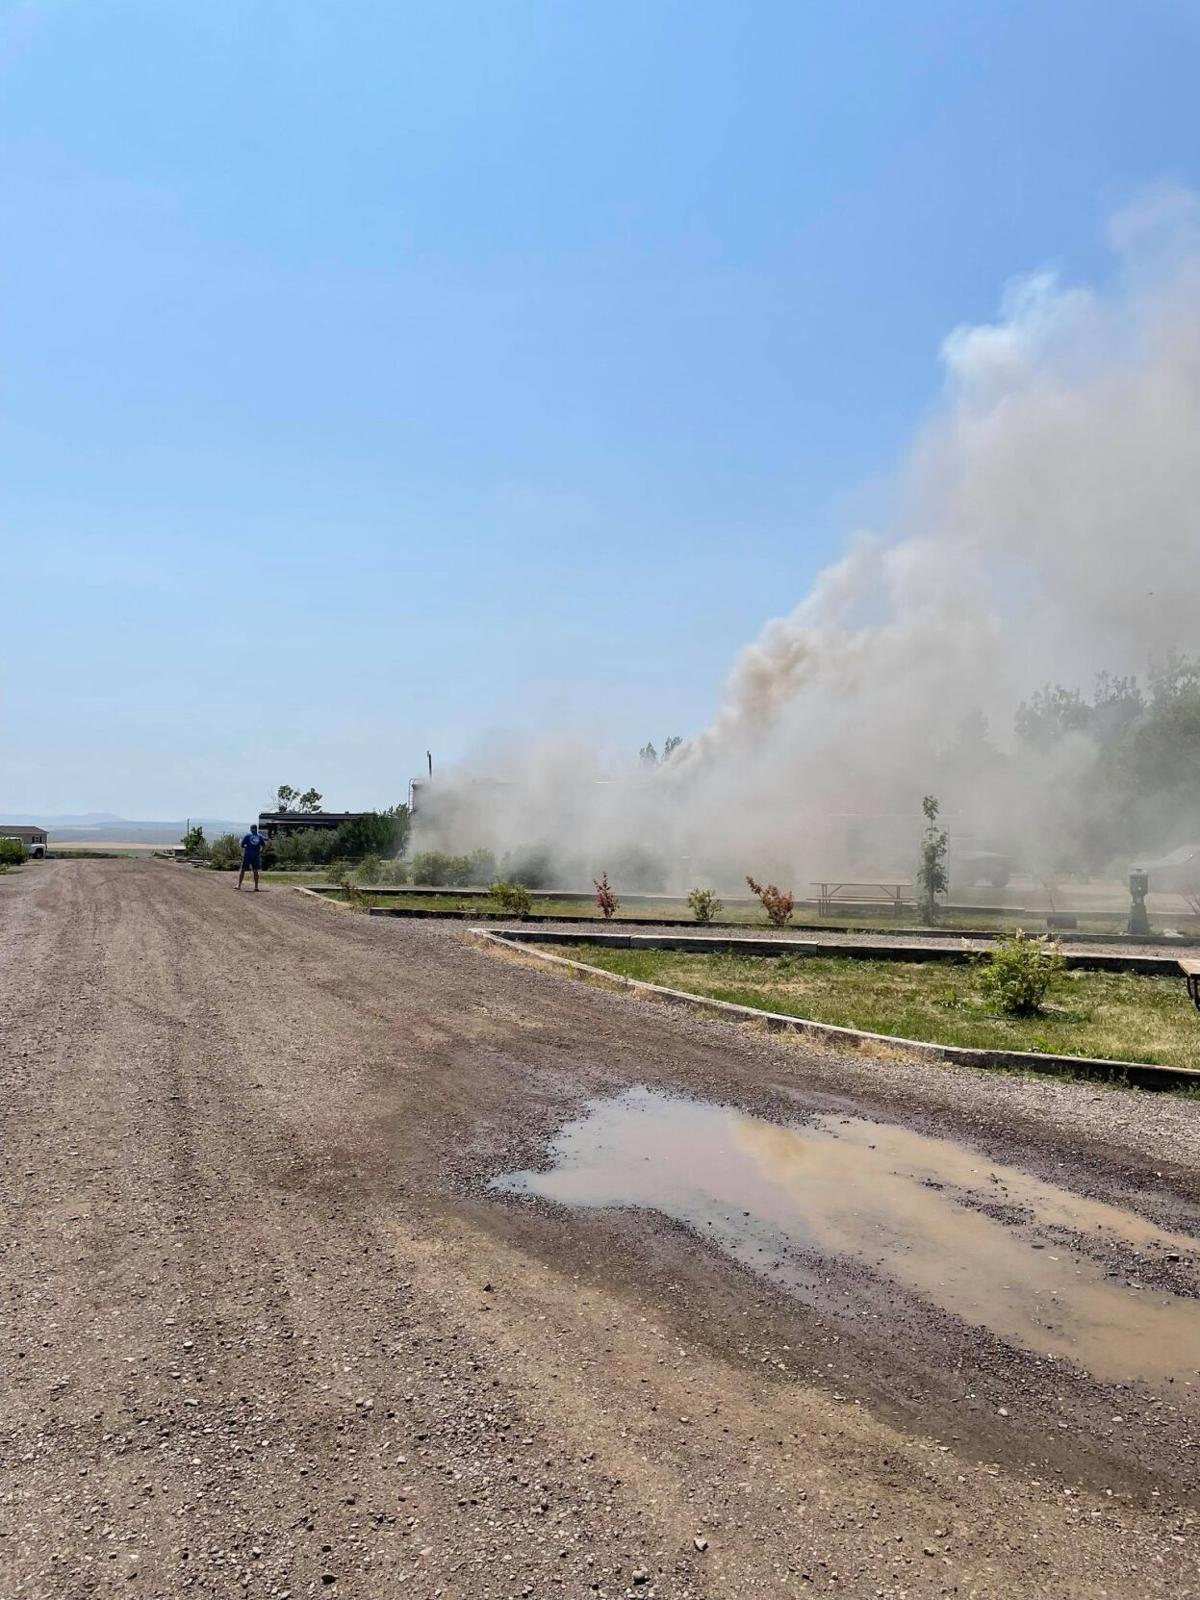 RV on fire at KOA in Great Falls